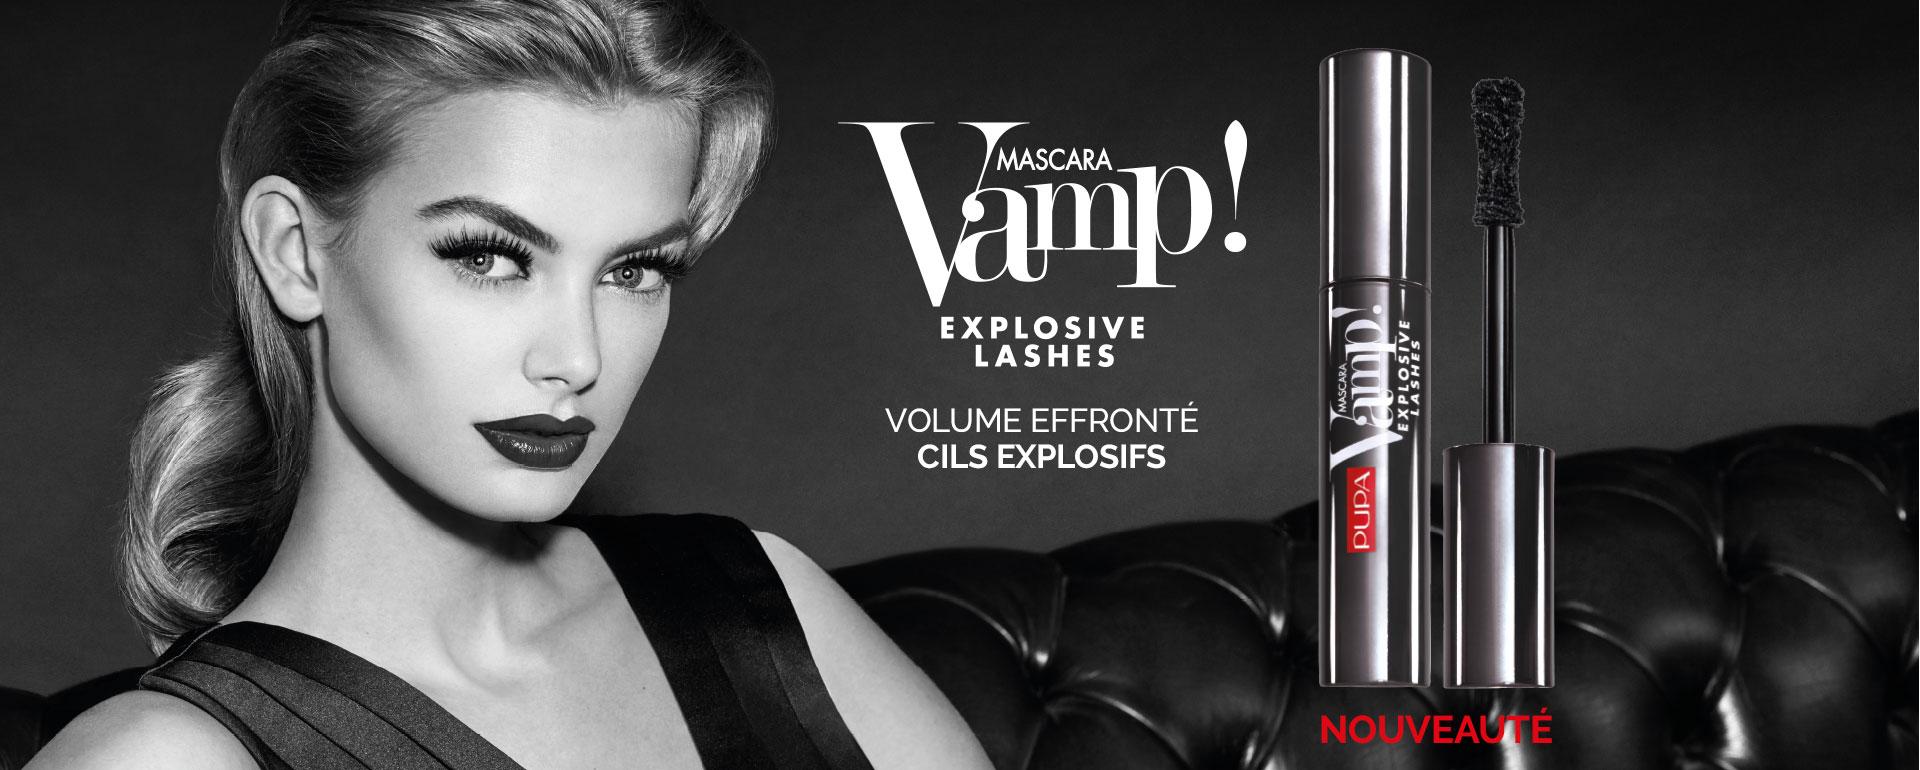 Vamp! Mascara Explosive Lashes